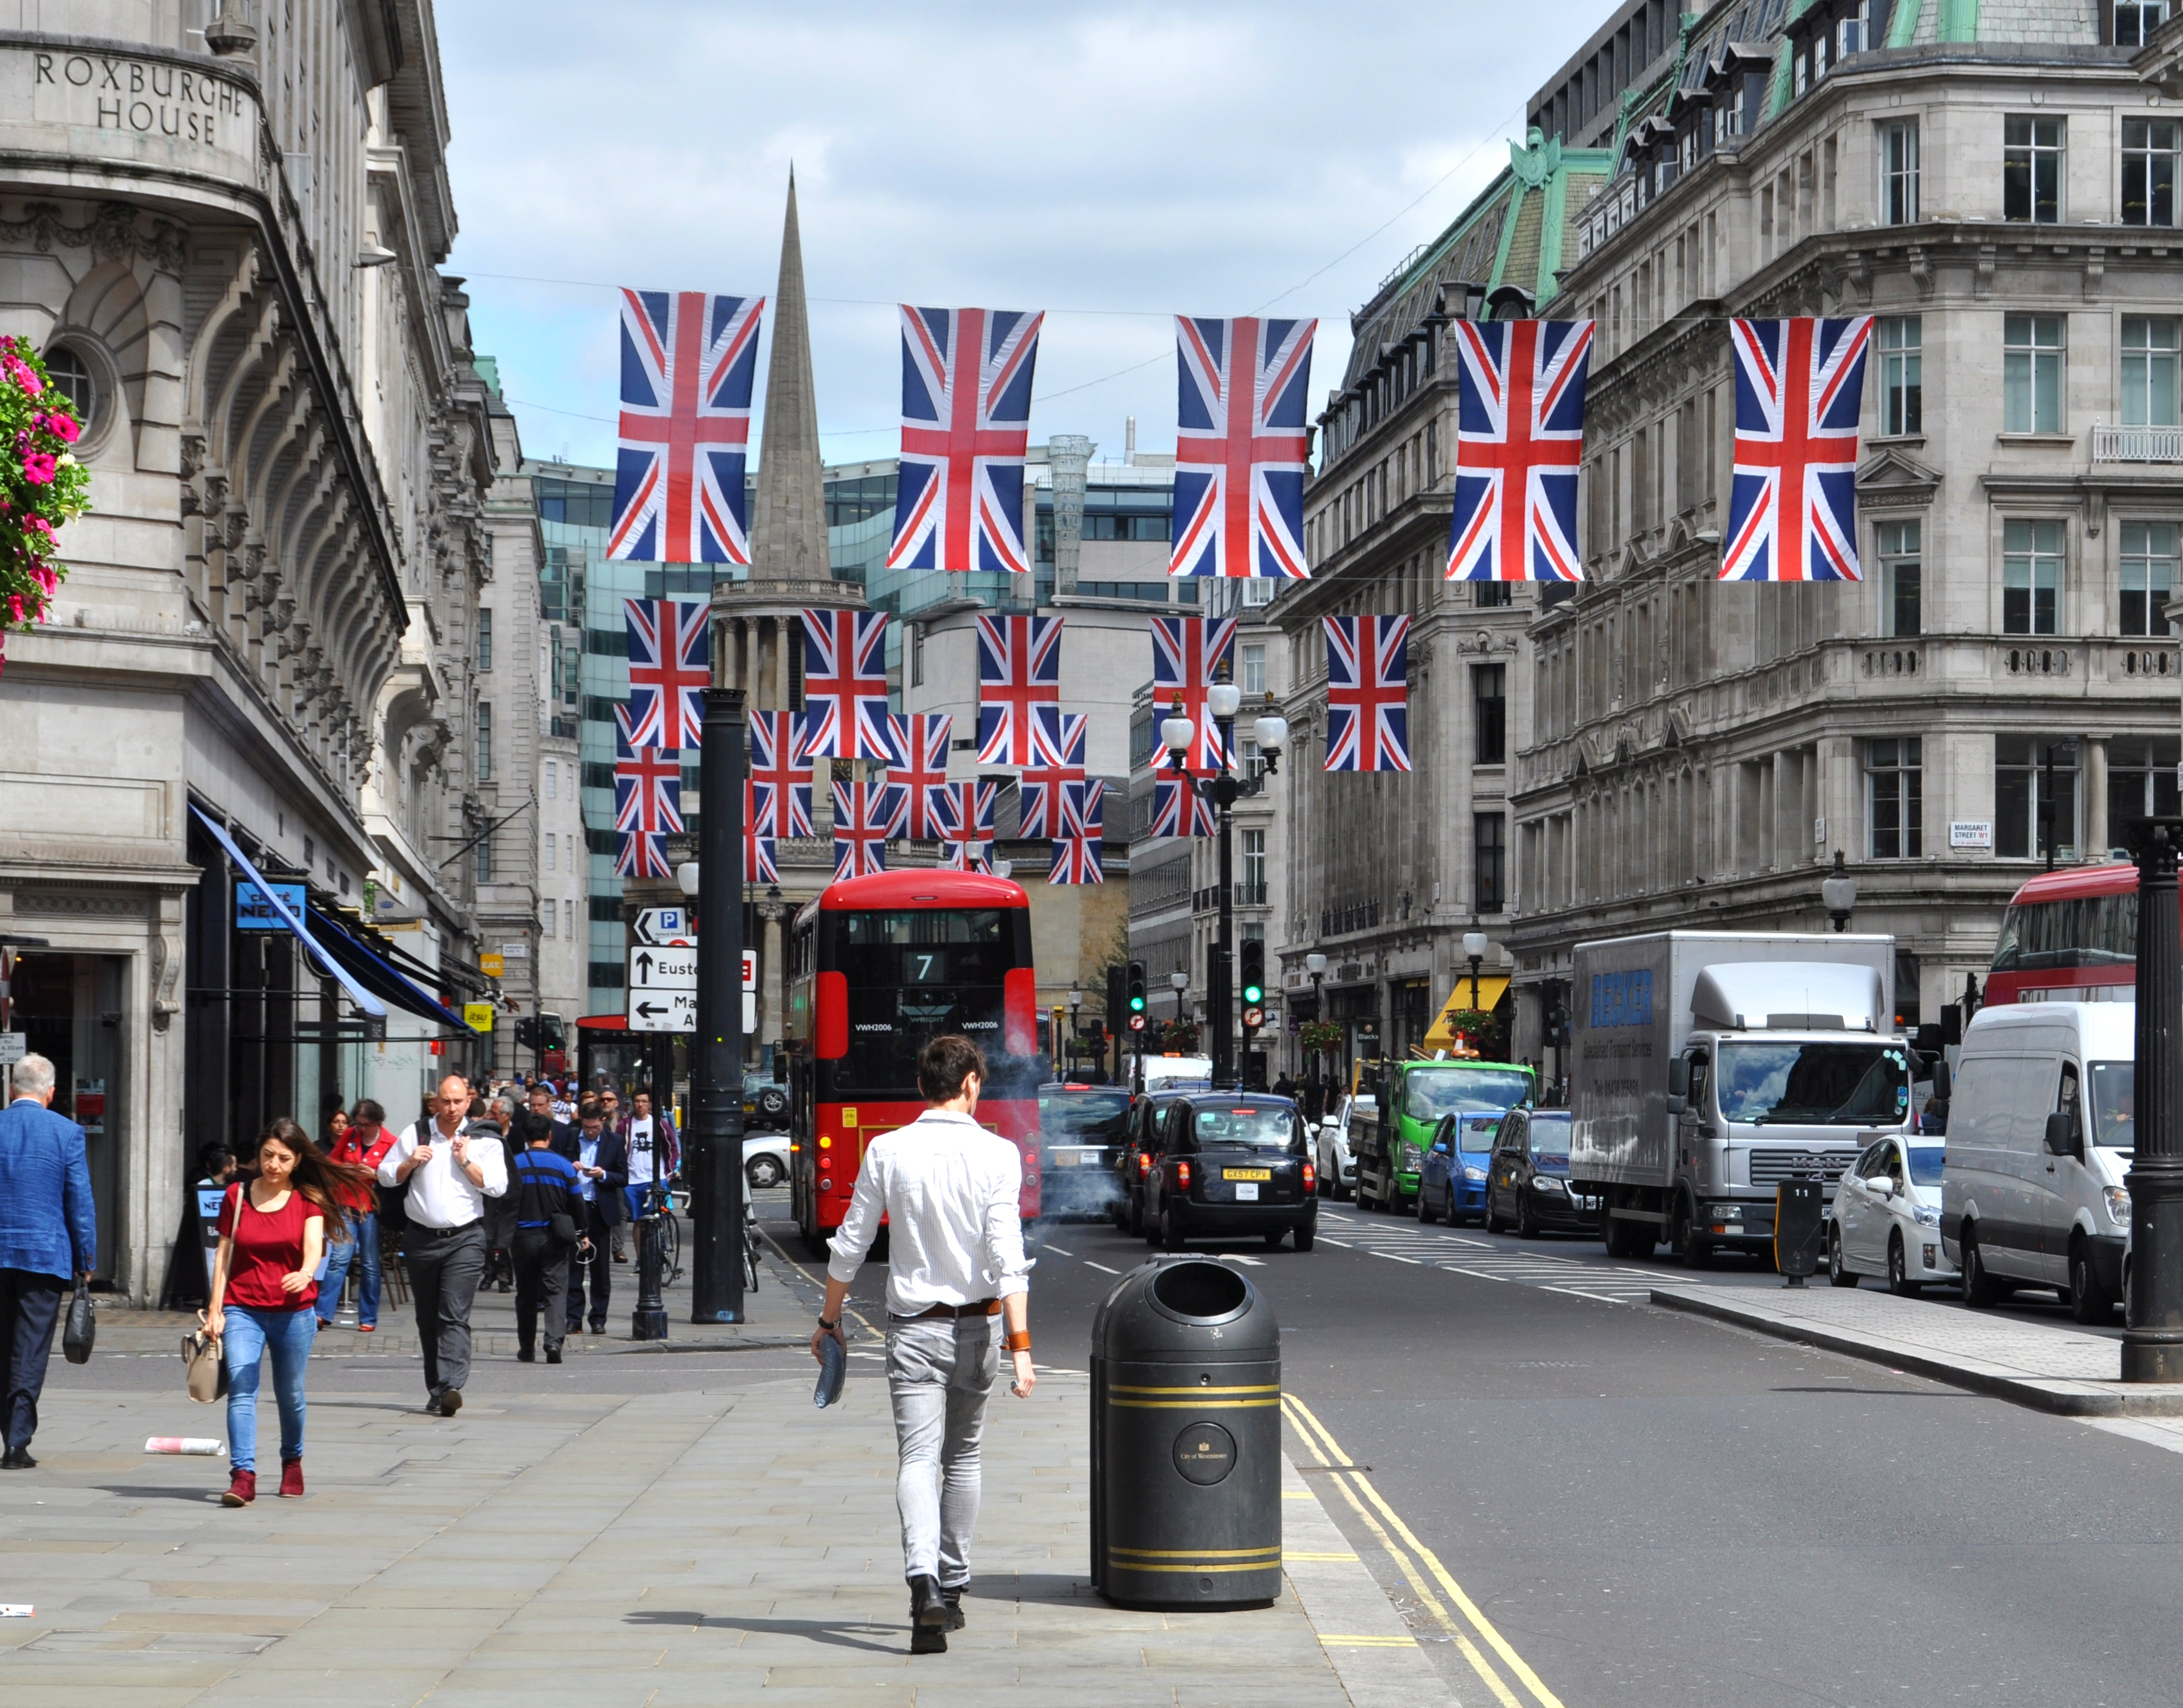 campaign, UK Brexit, referendum, Regent Street